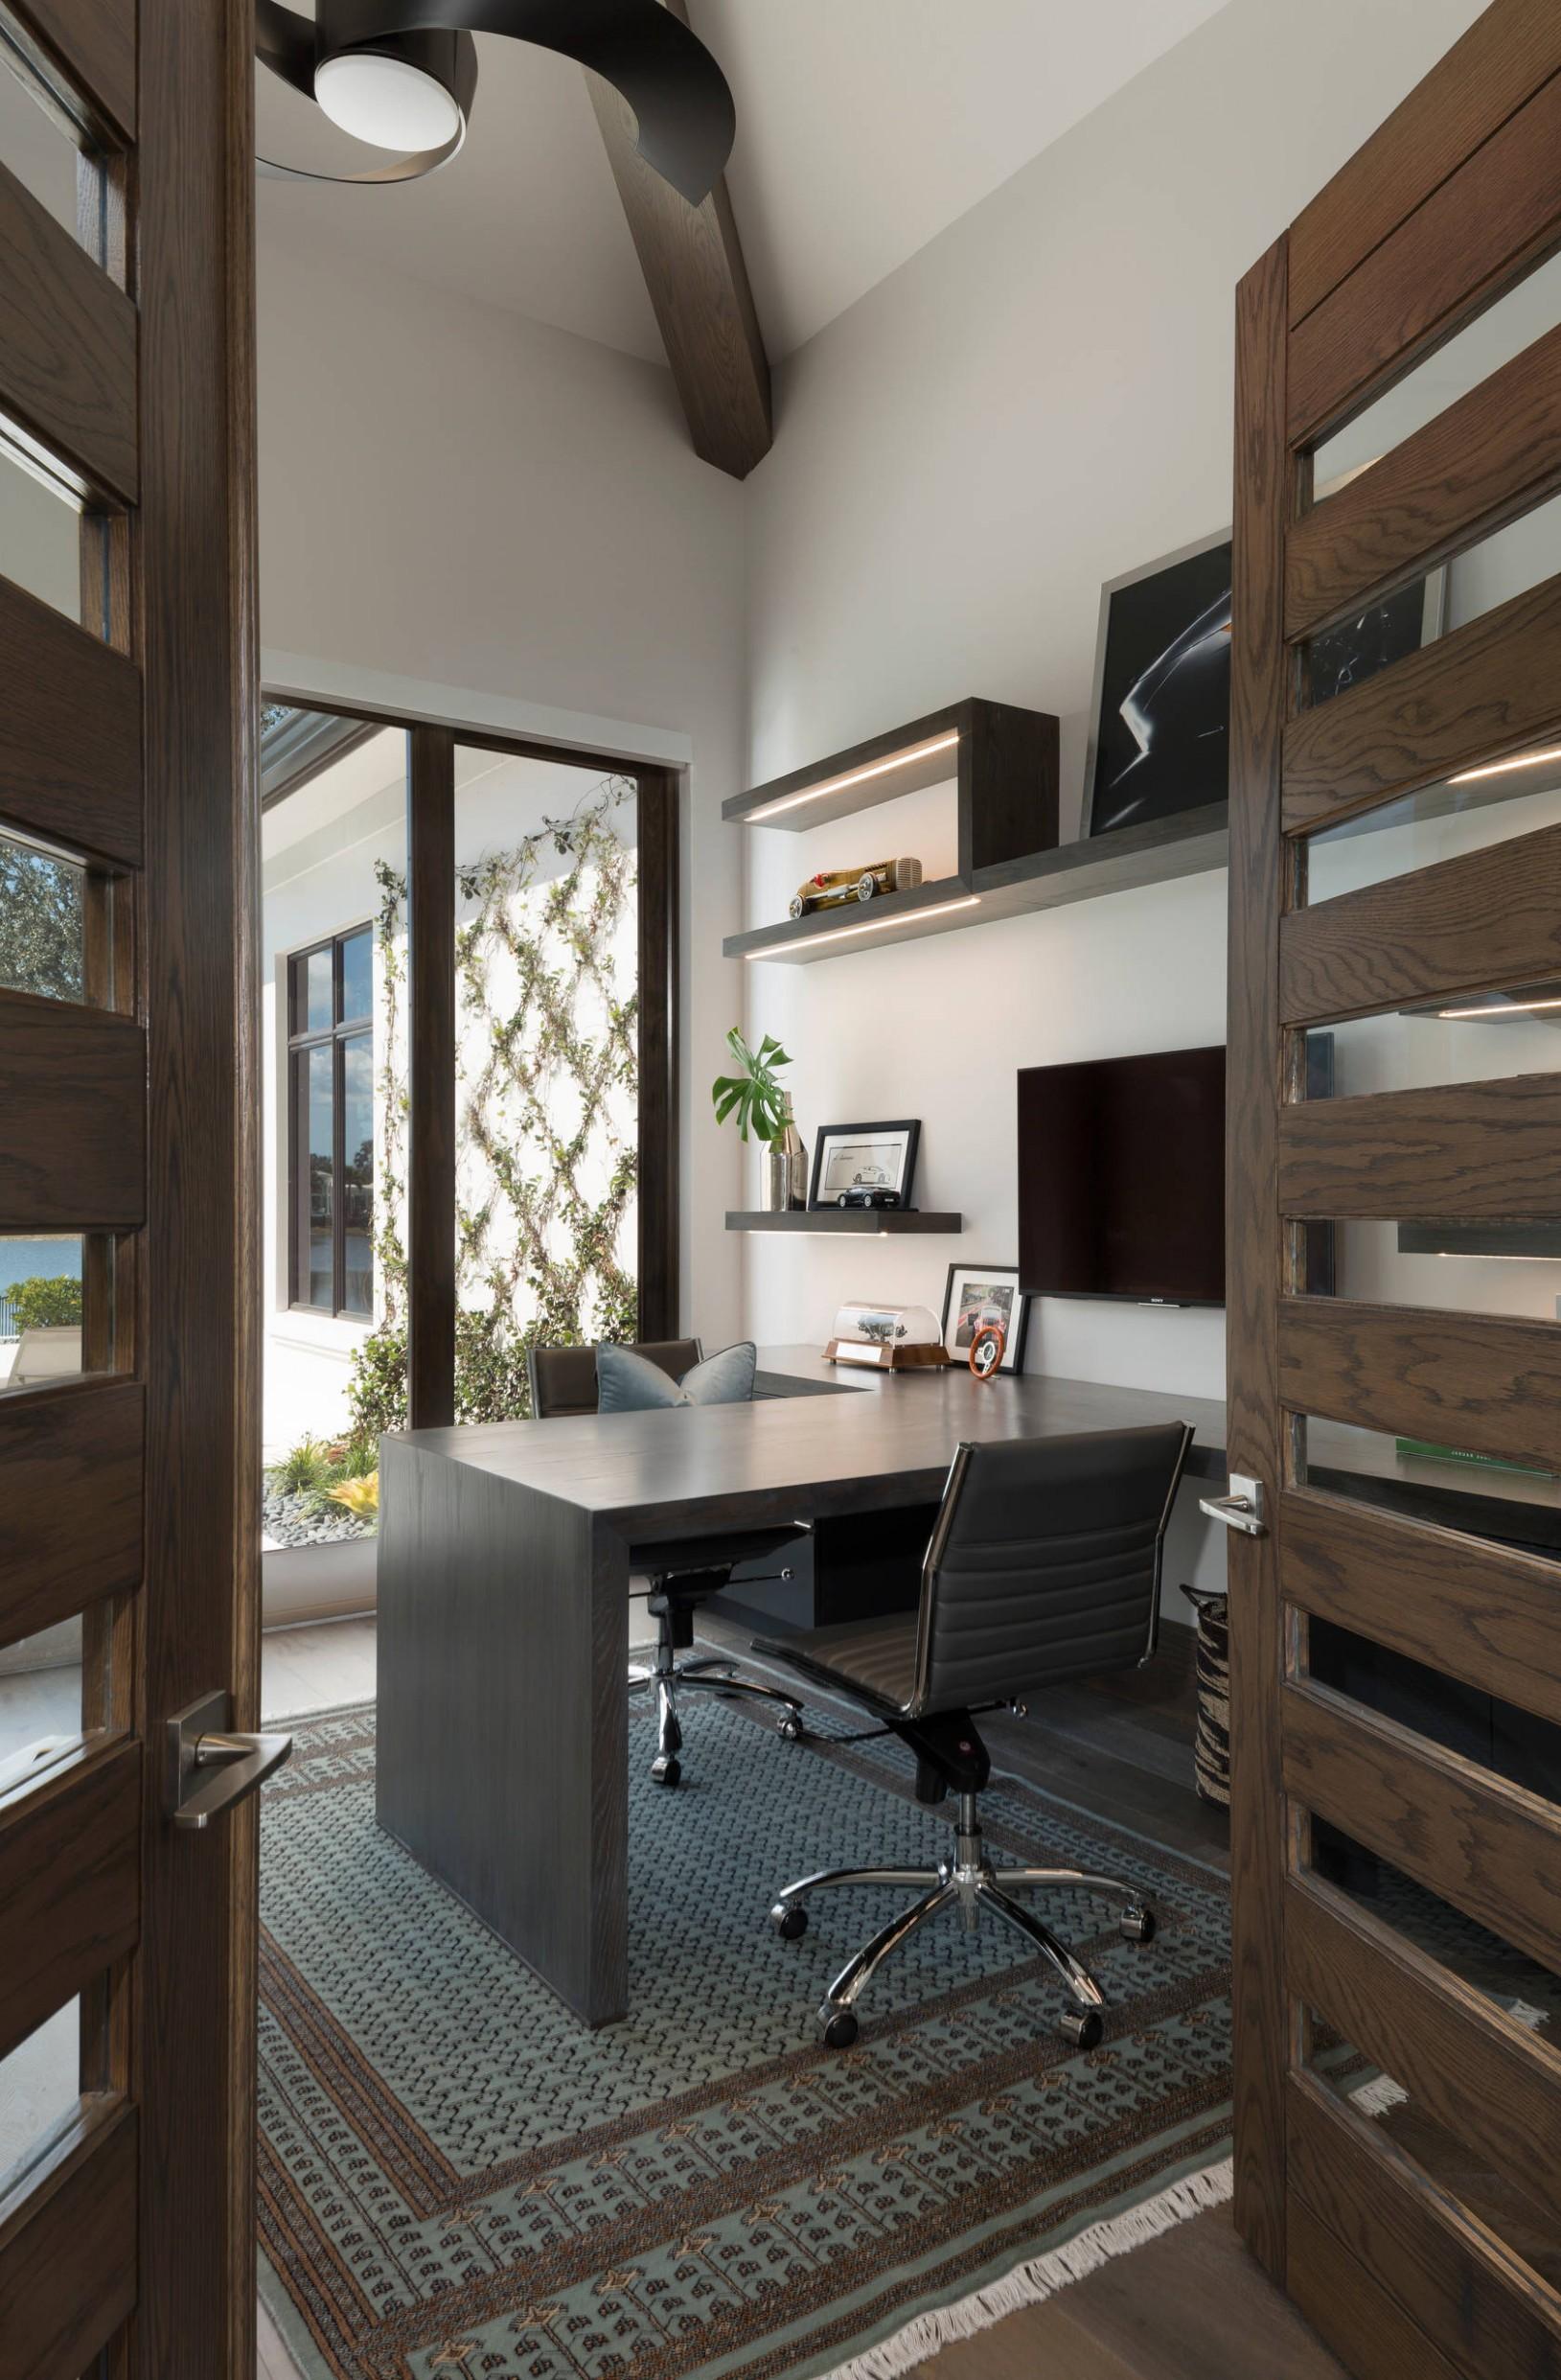 8 Beautiful Modern Home Office Design Ideas & Pictures  Houzz - Home Office Ideas Modern